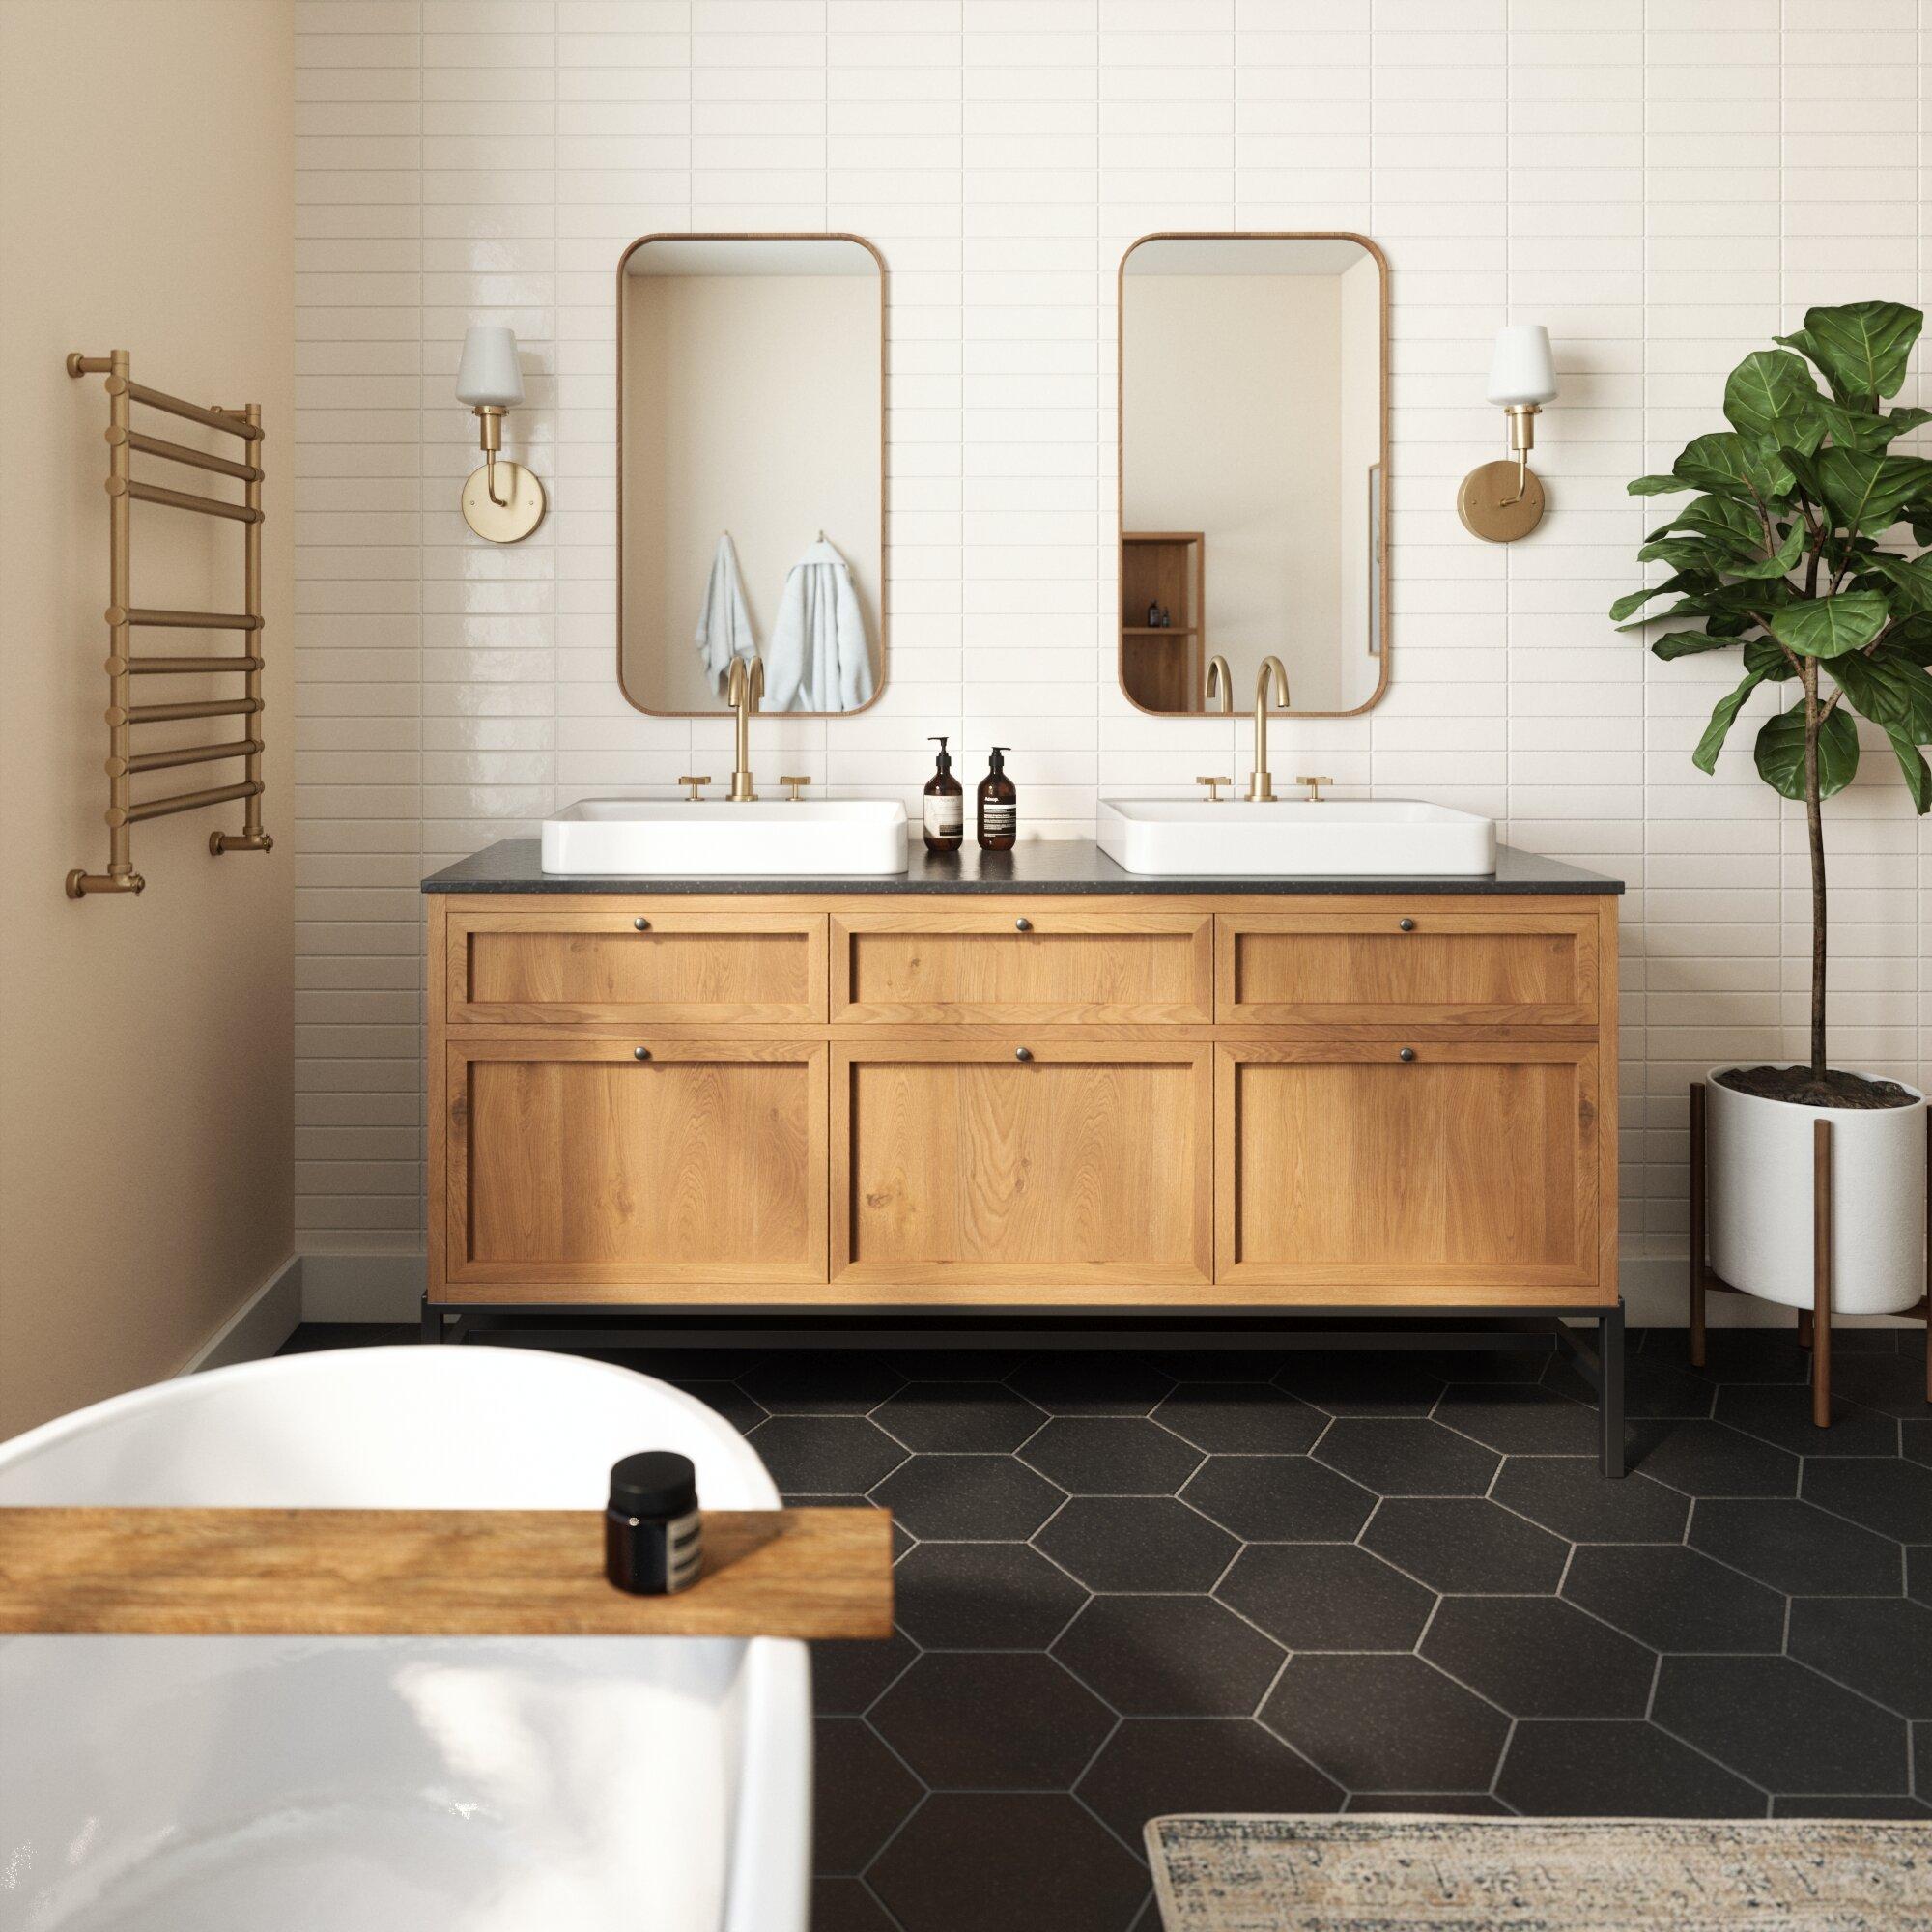 Bathroom Salle De Bain magog bathroom — anthology